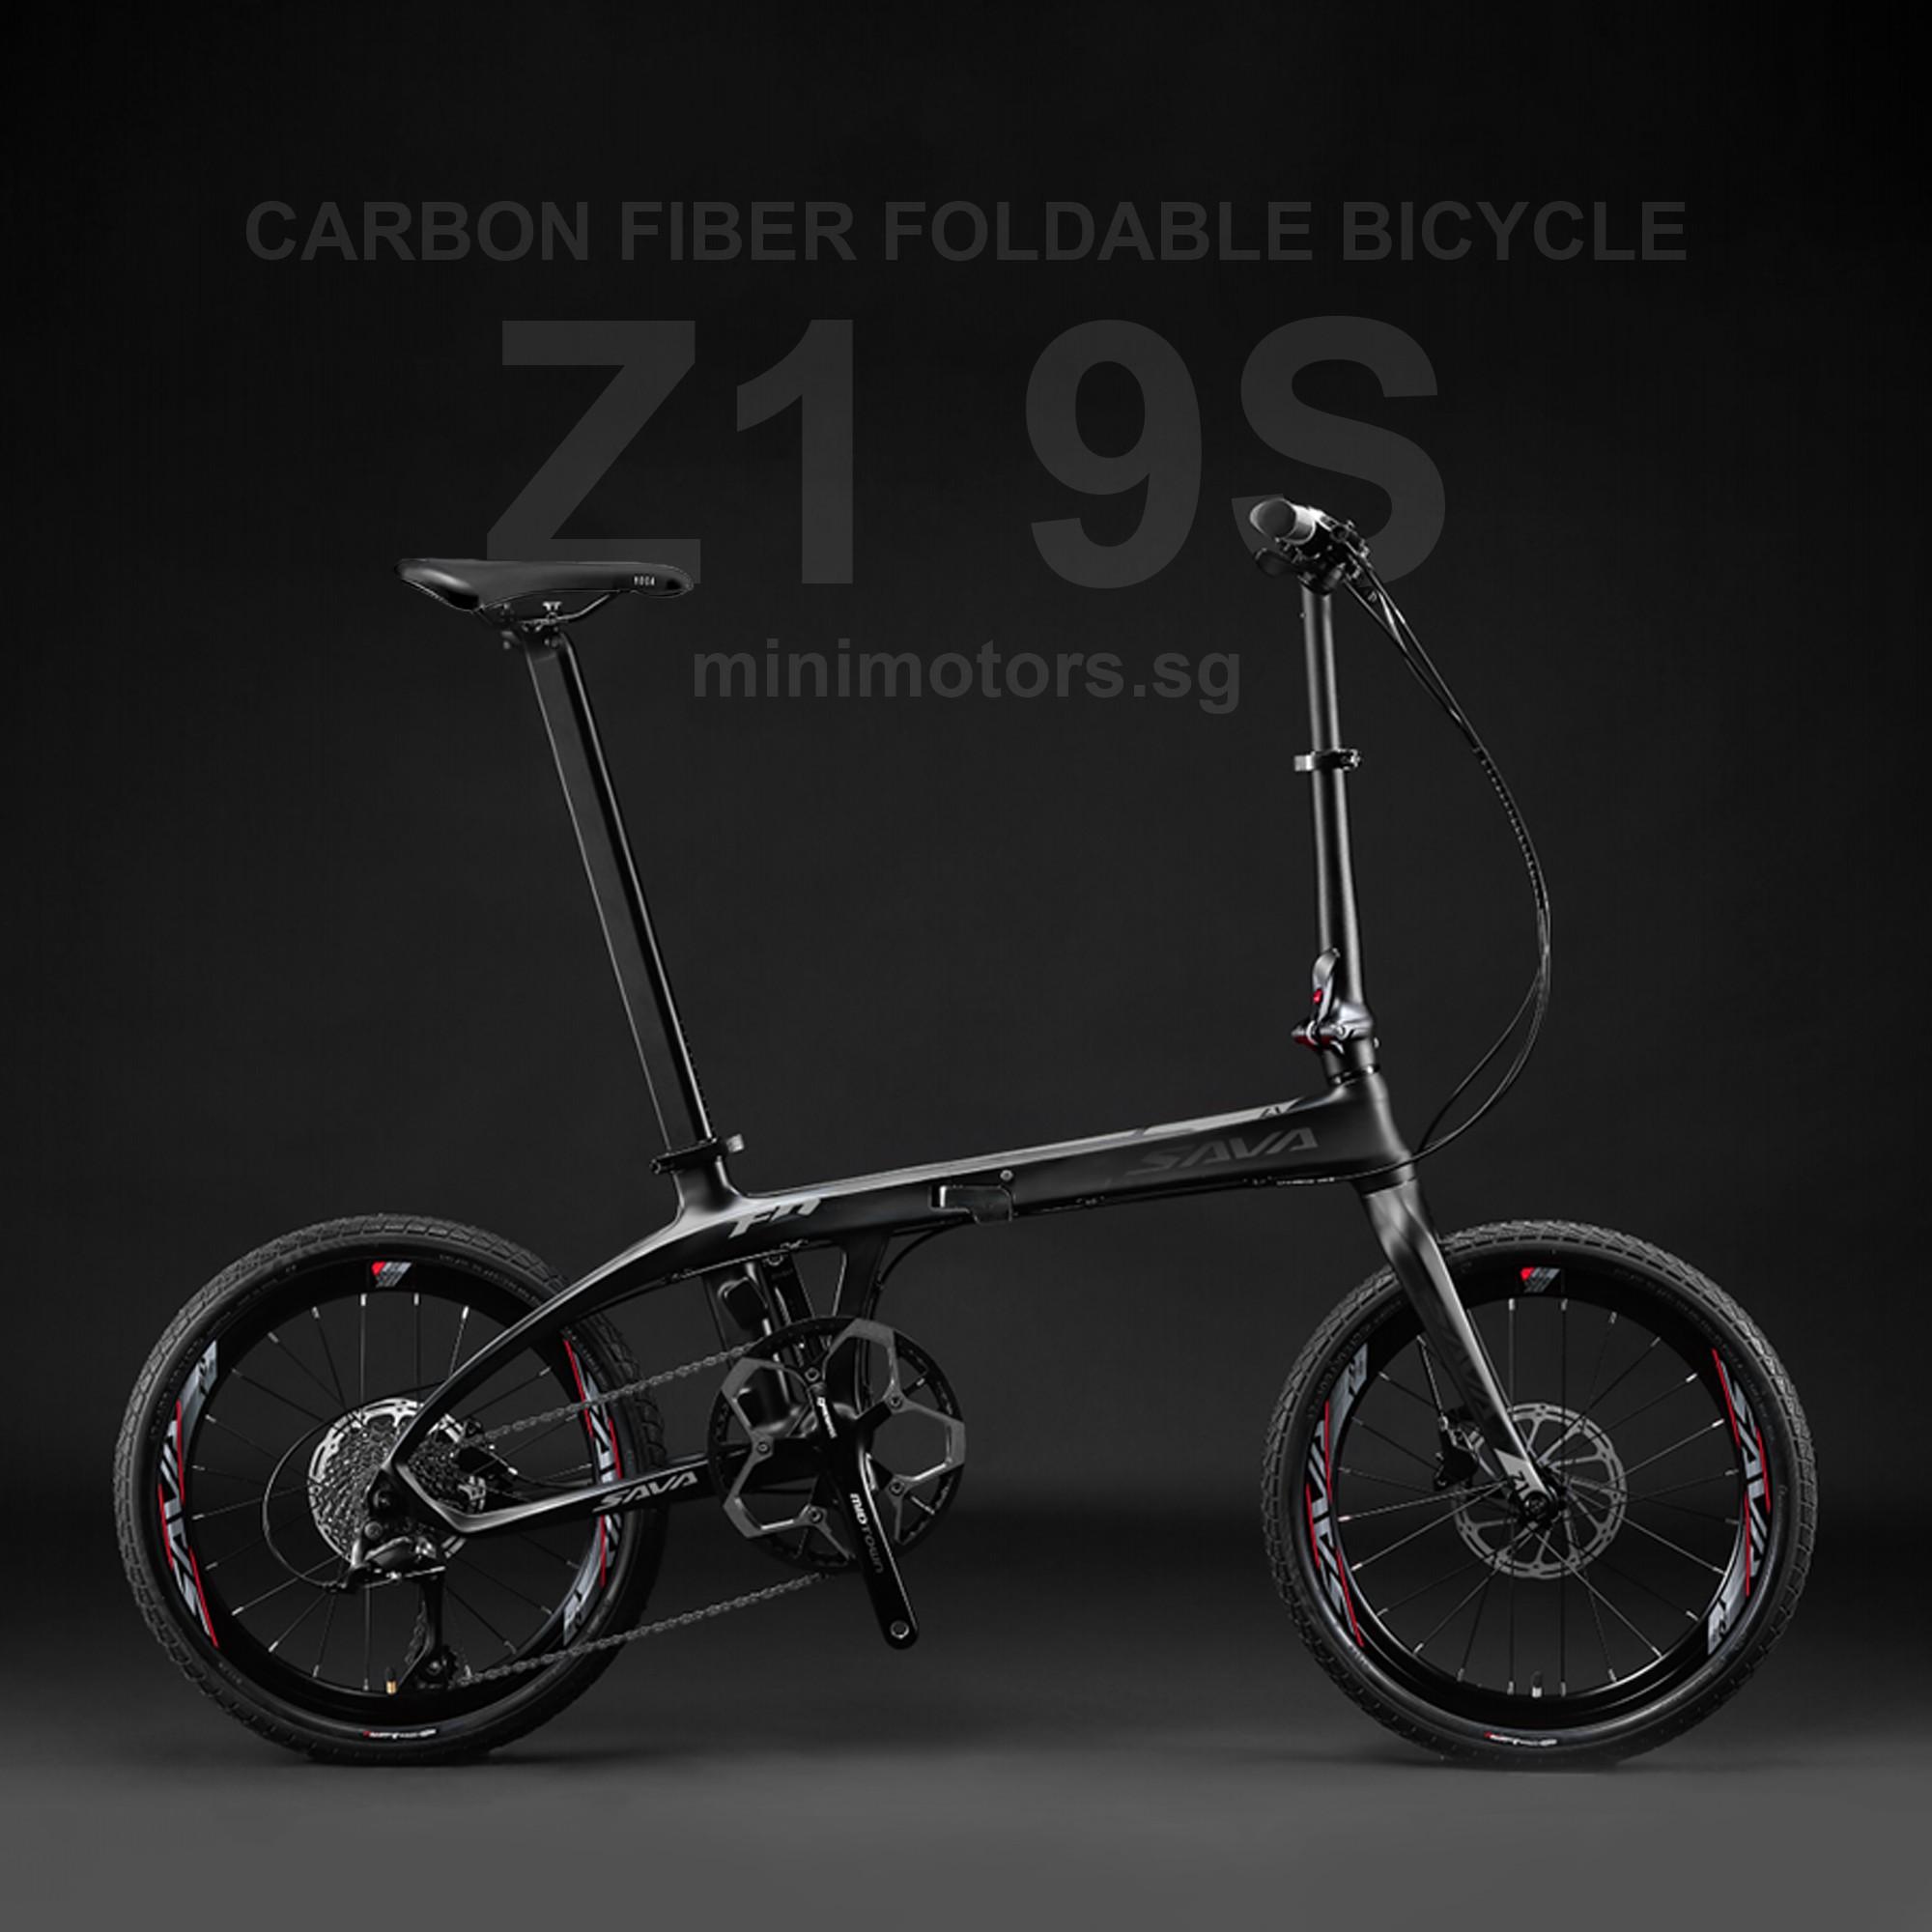 Z1 9S Carbon Fiber Folding Bike   Shimano Sora R3000   Free Shipping & Assemble   5 Years Warranty